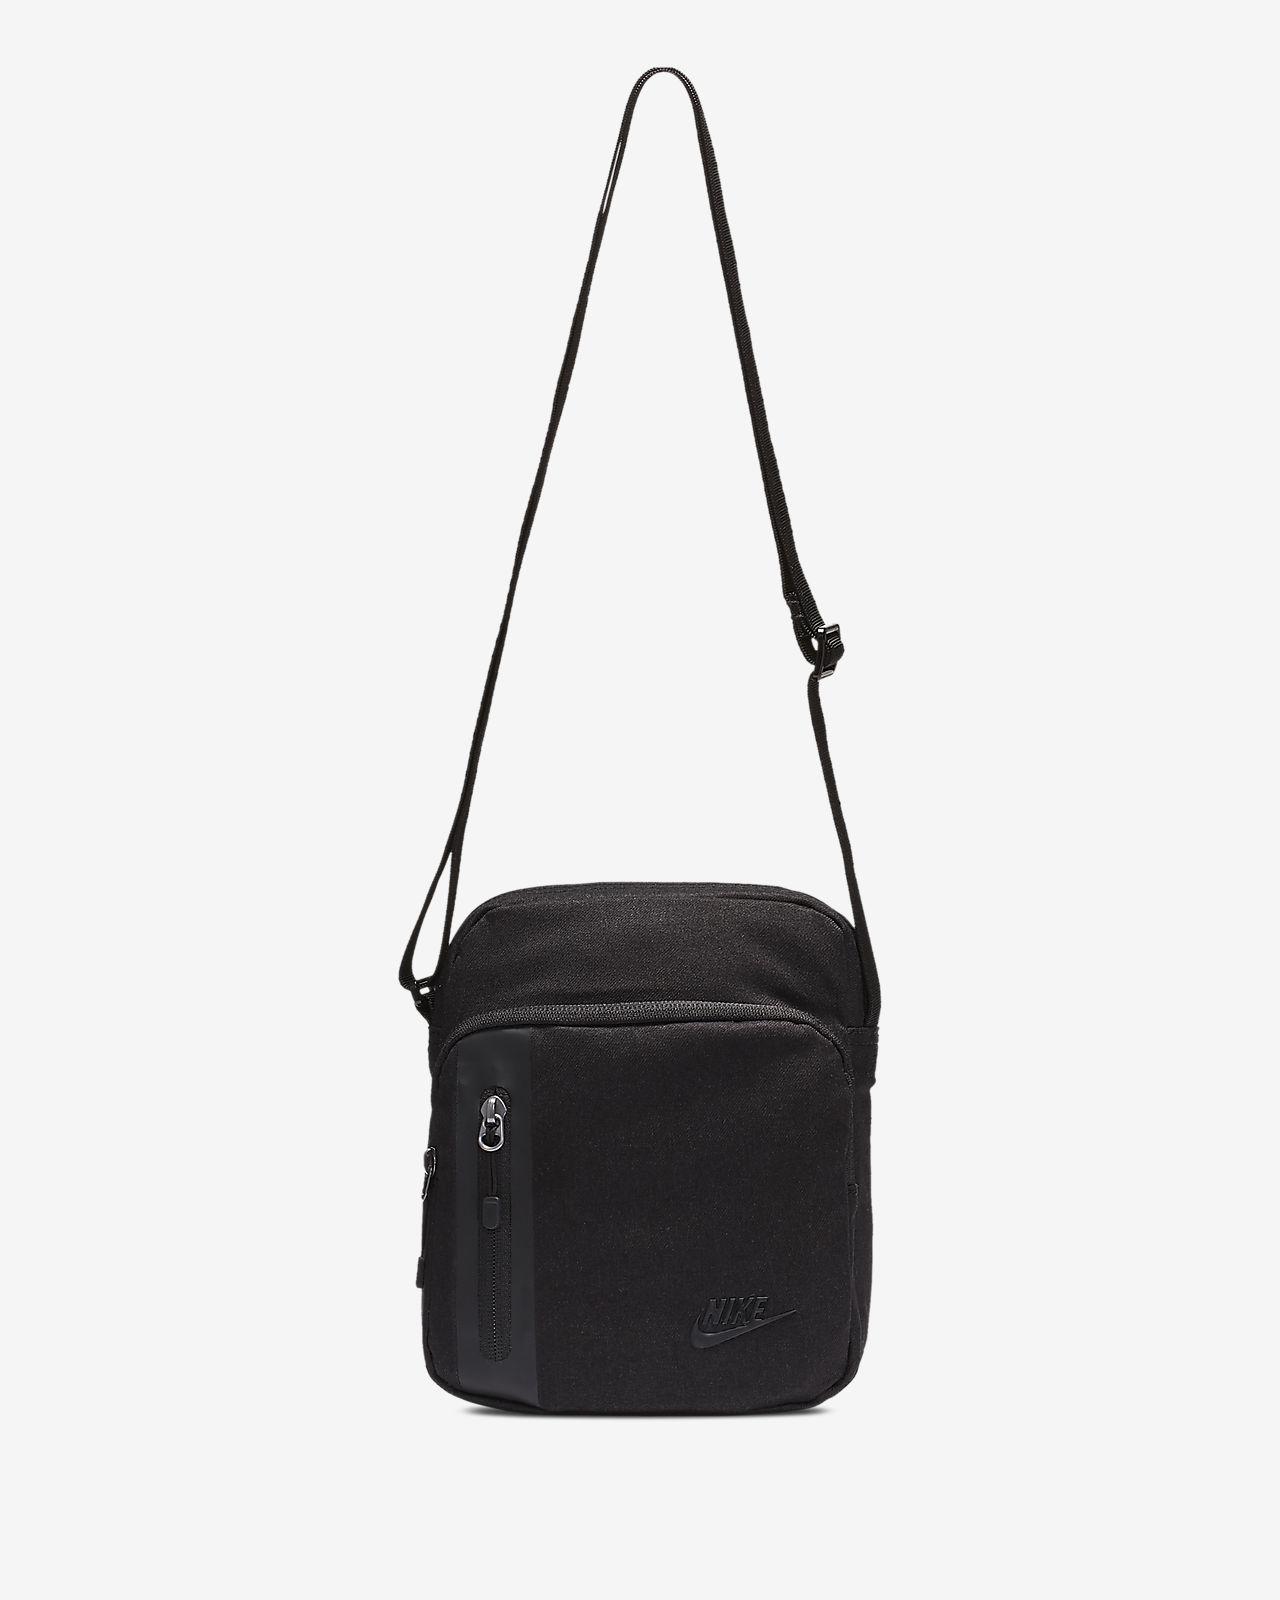 Nike Core Small Items 3.0 Bossa